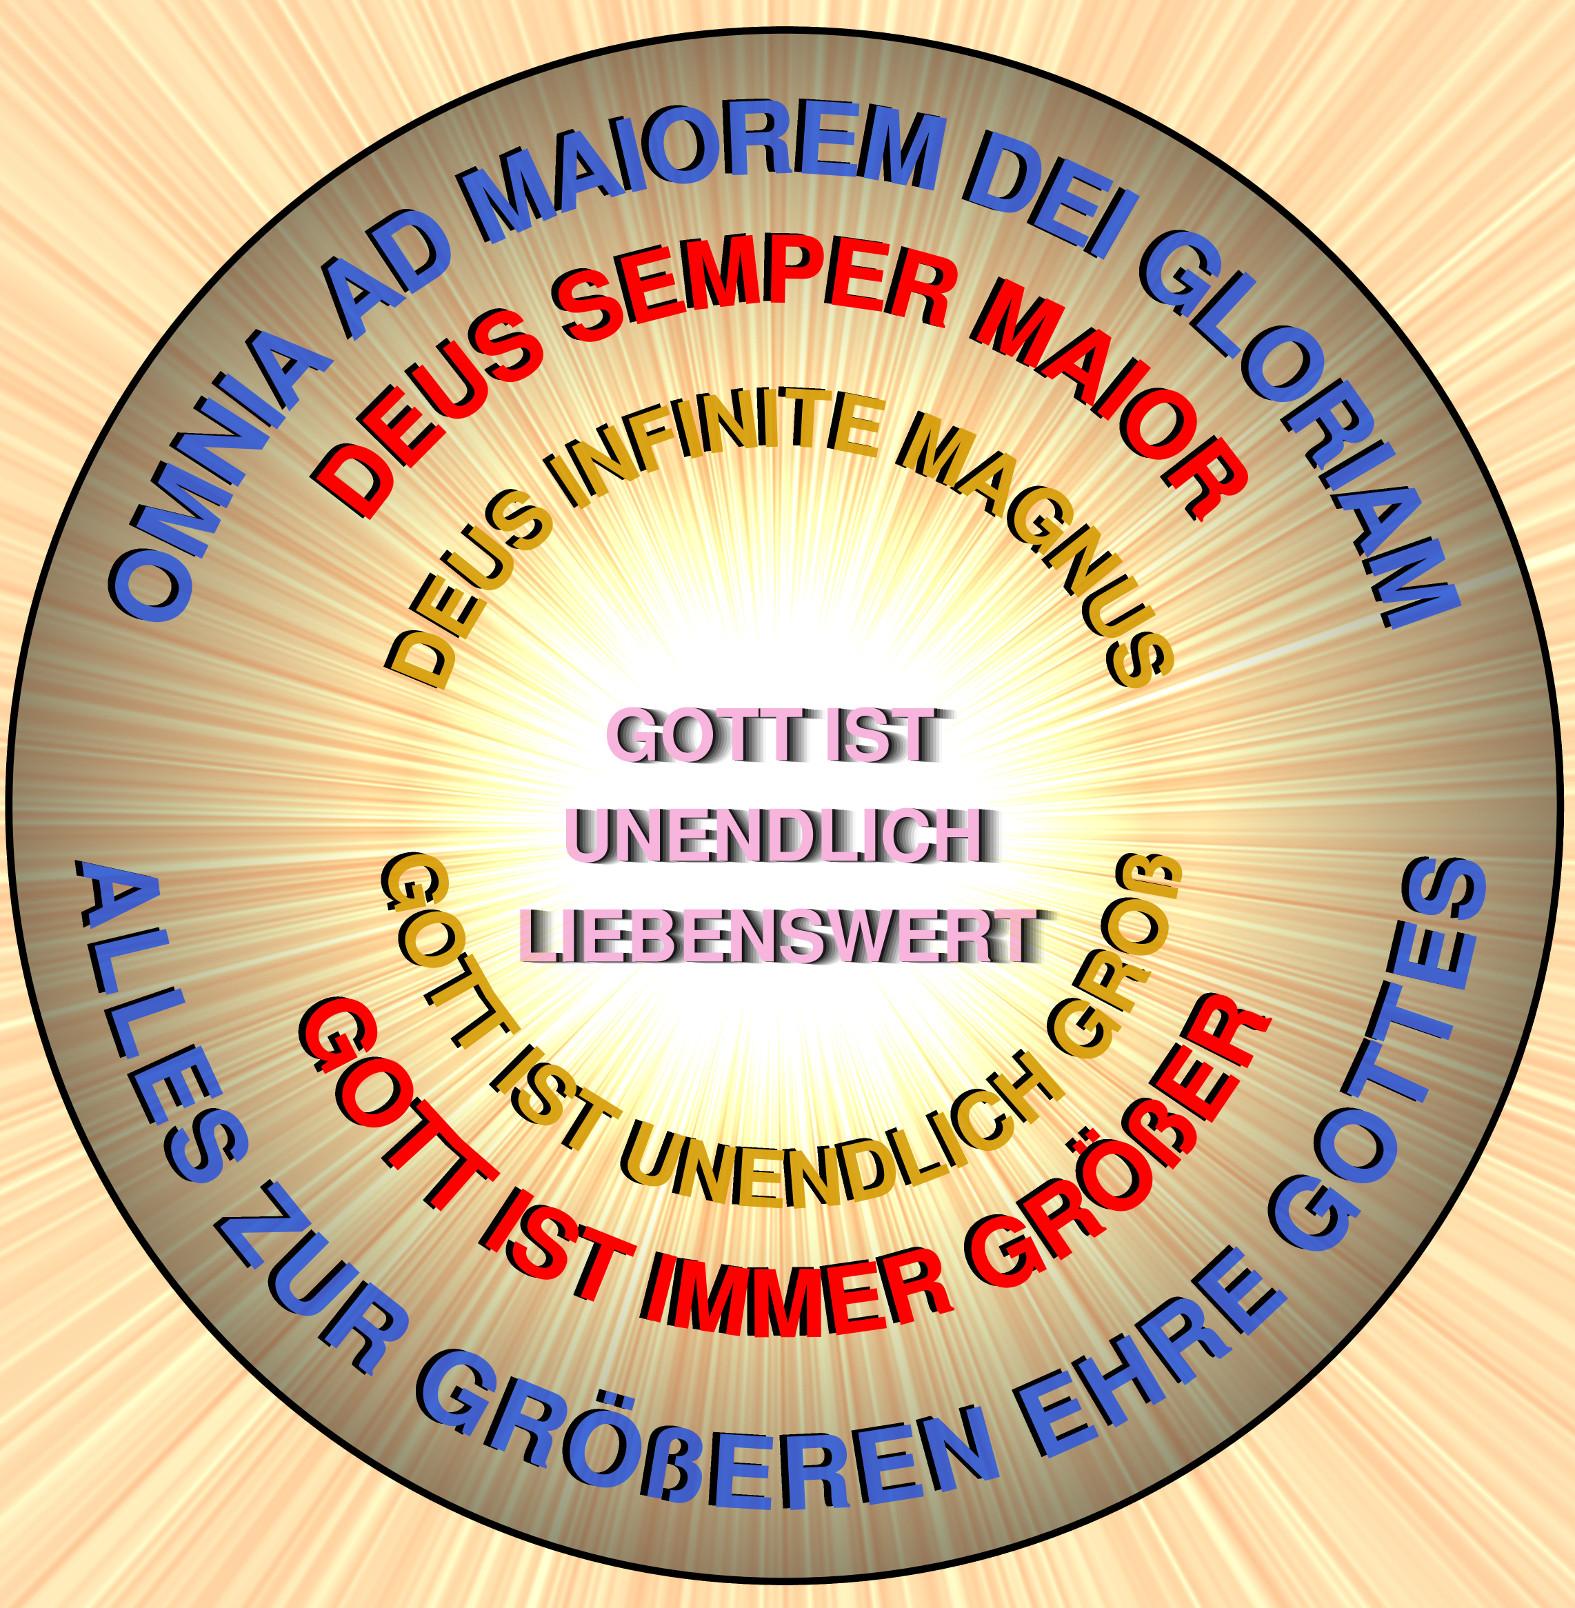 Image admdgl400mwsn1